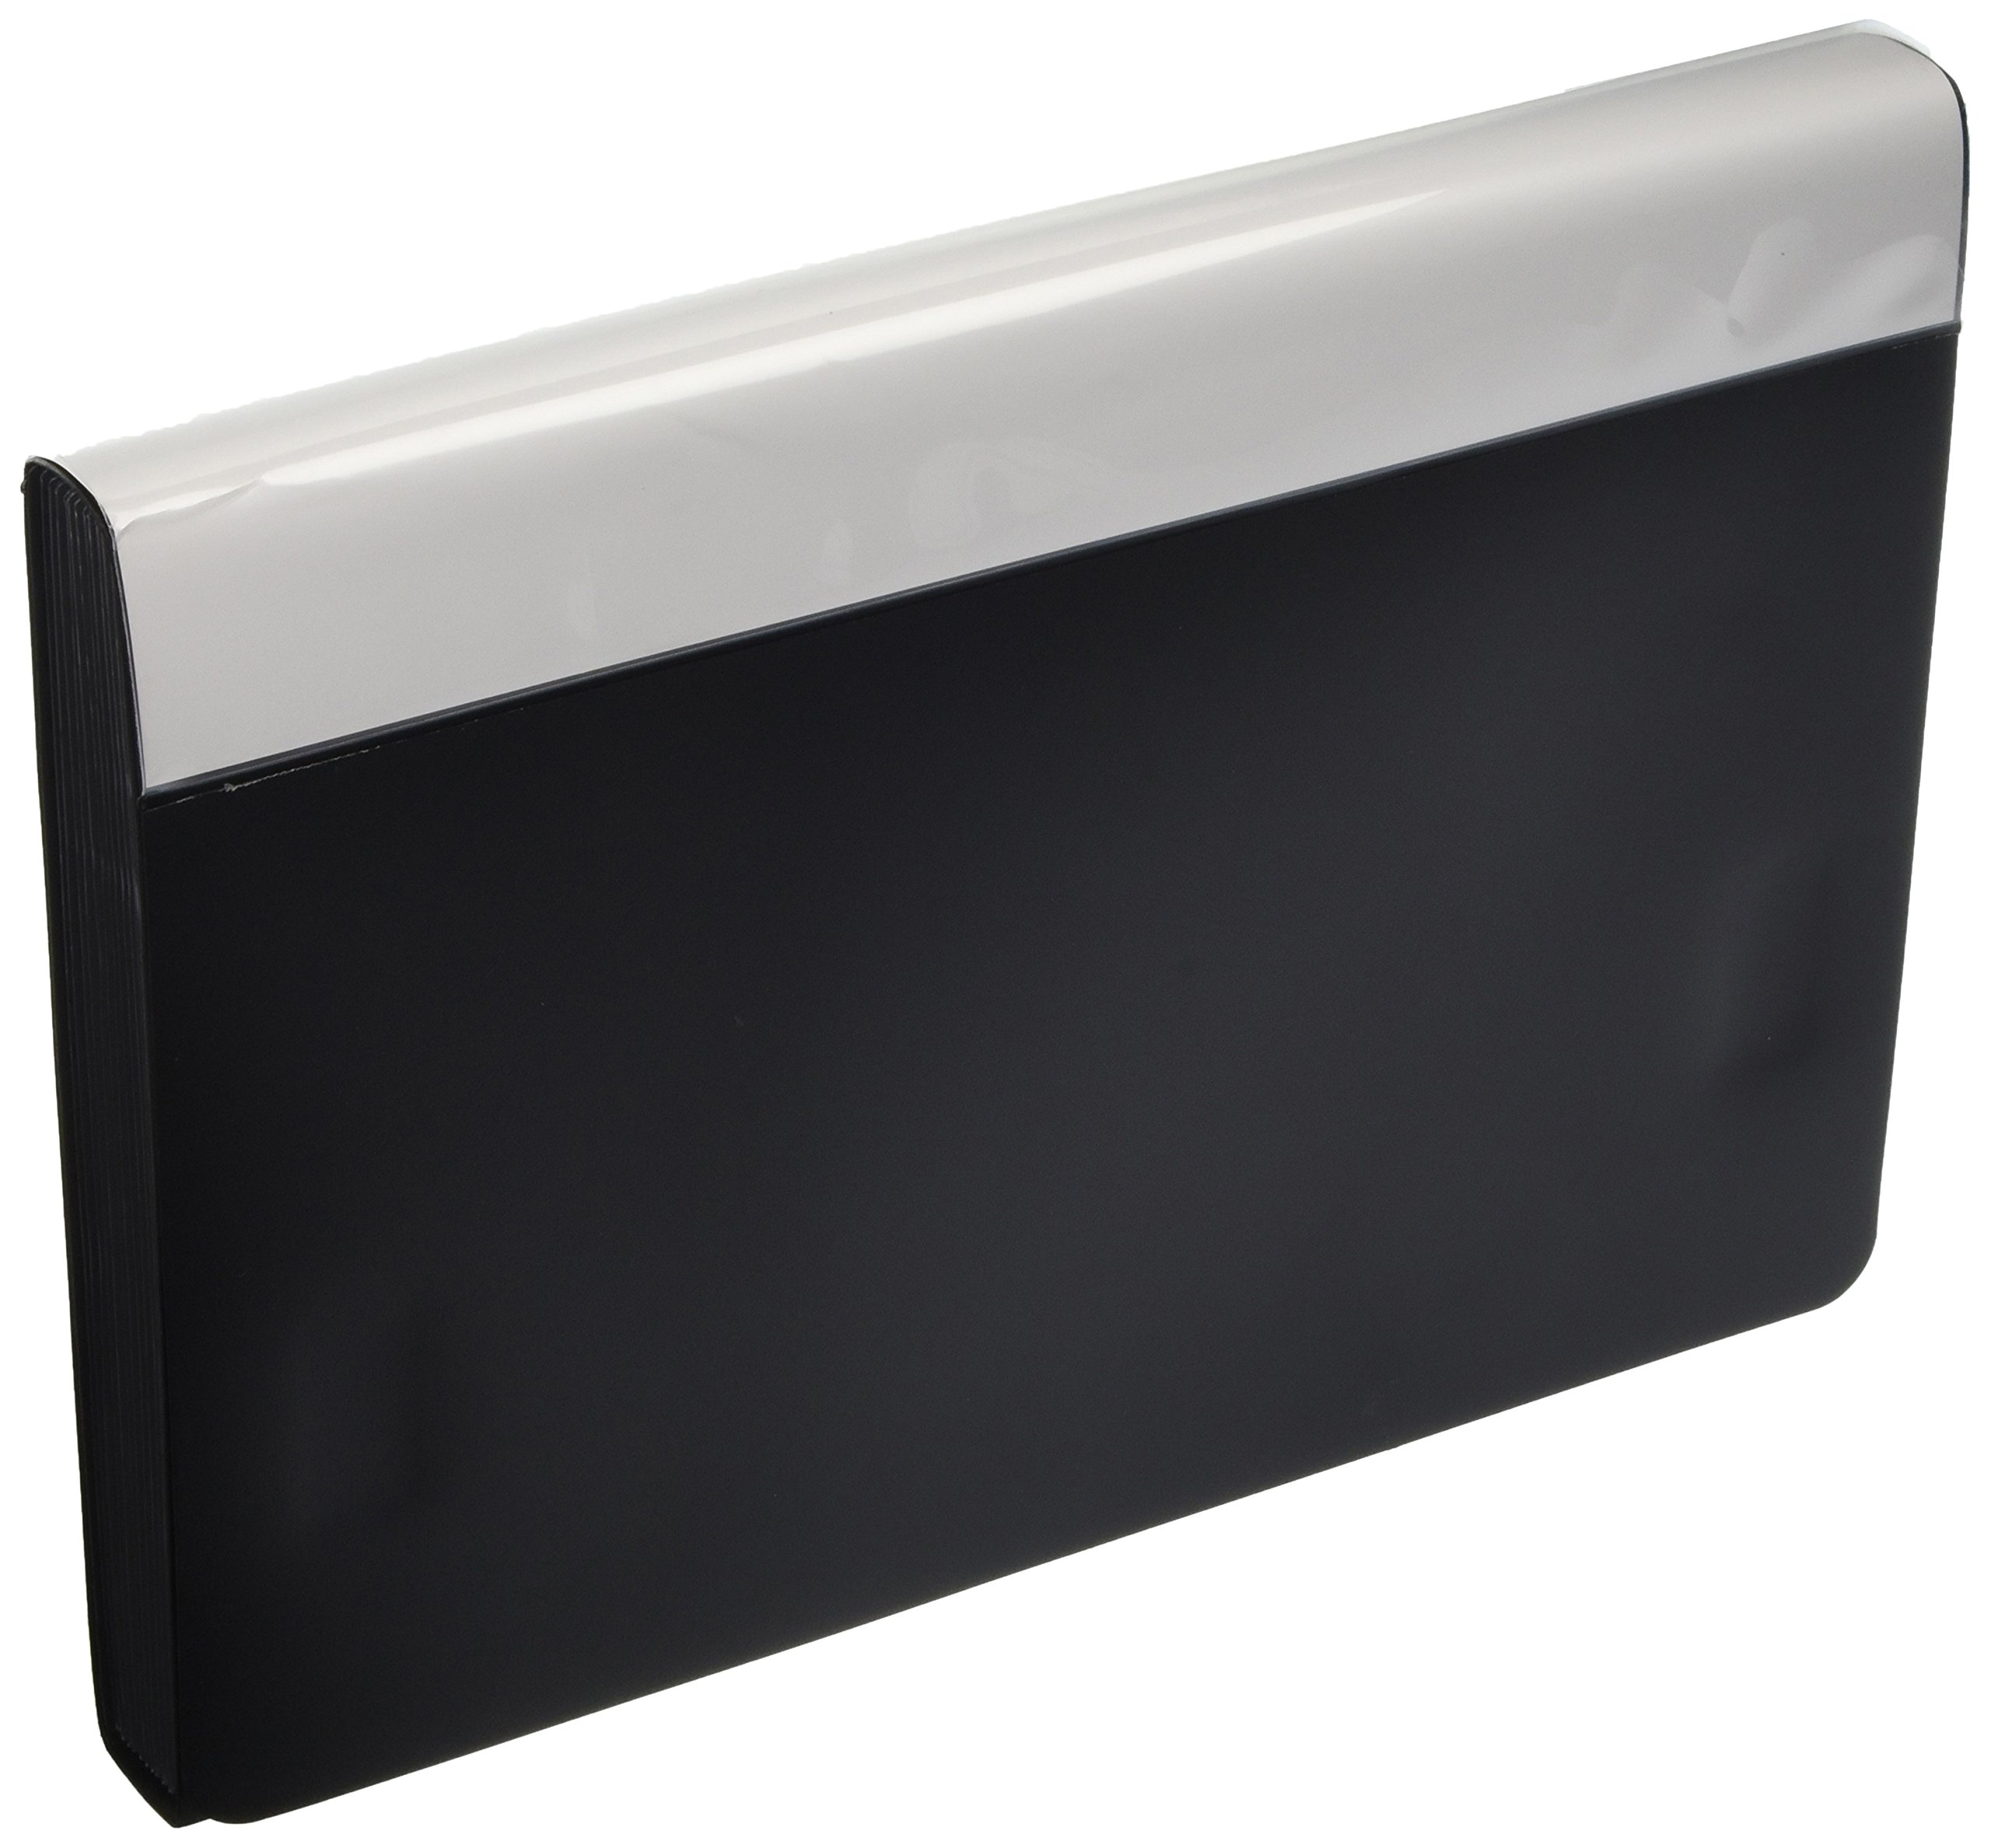 Pendaflex 82011 Poly Expanding File/Velcro Closure, 13-Pocket/Insertable Tabs, Letter, Black (82011)